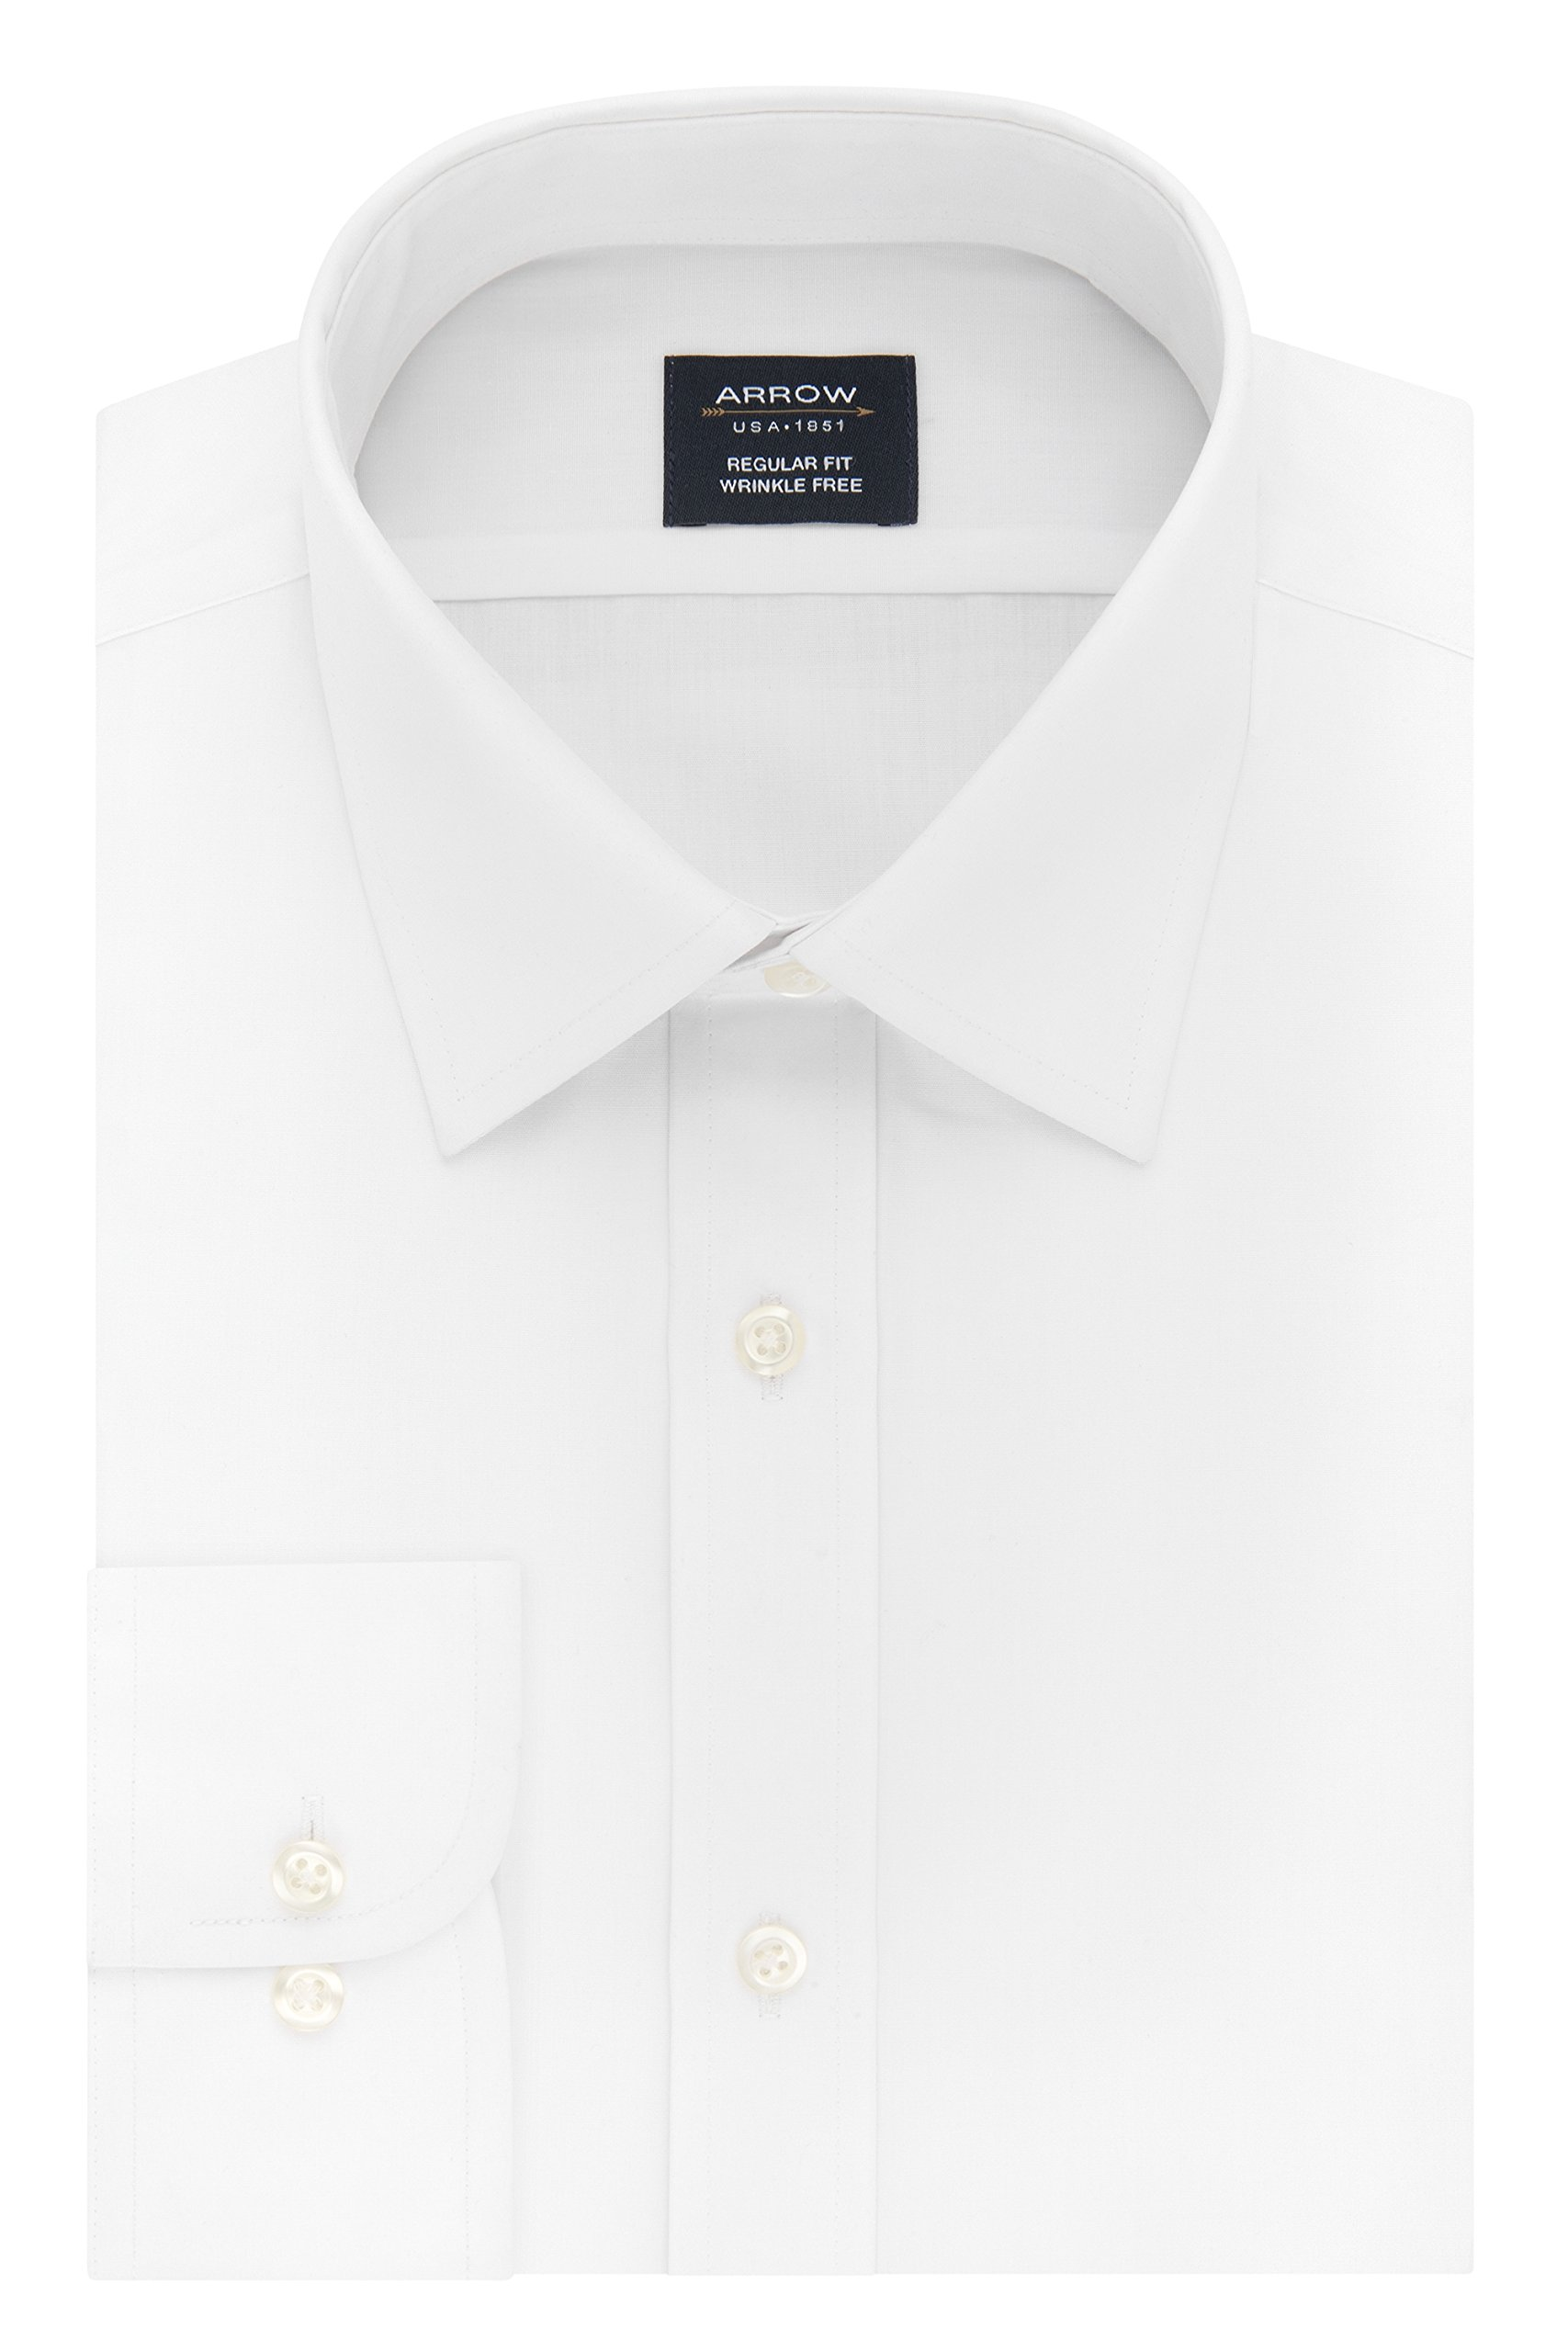 Arrow Men's Dress Shirt Poplin Regular Fit Spread Collar, White, 16-16.5'' Neck 34-35'' Sleeve